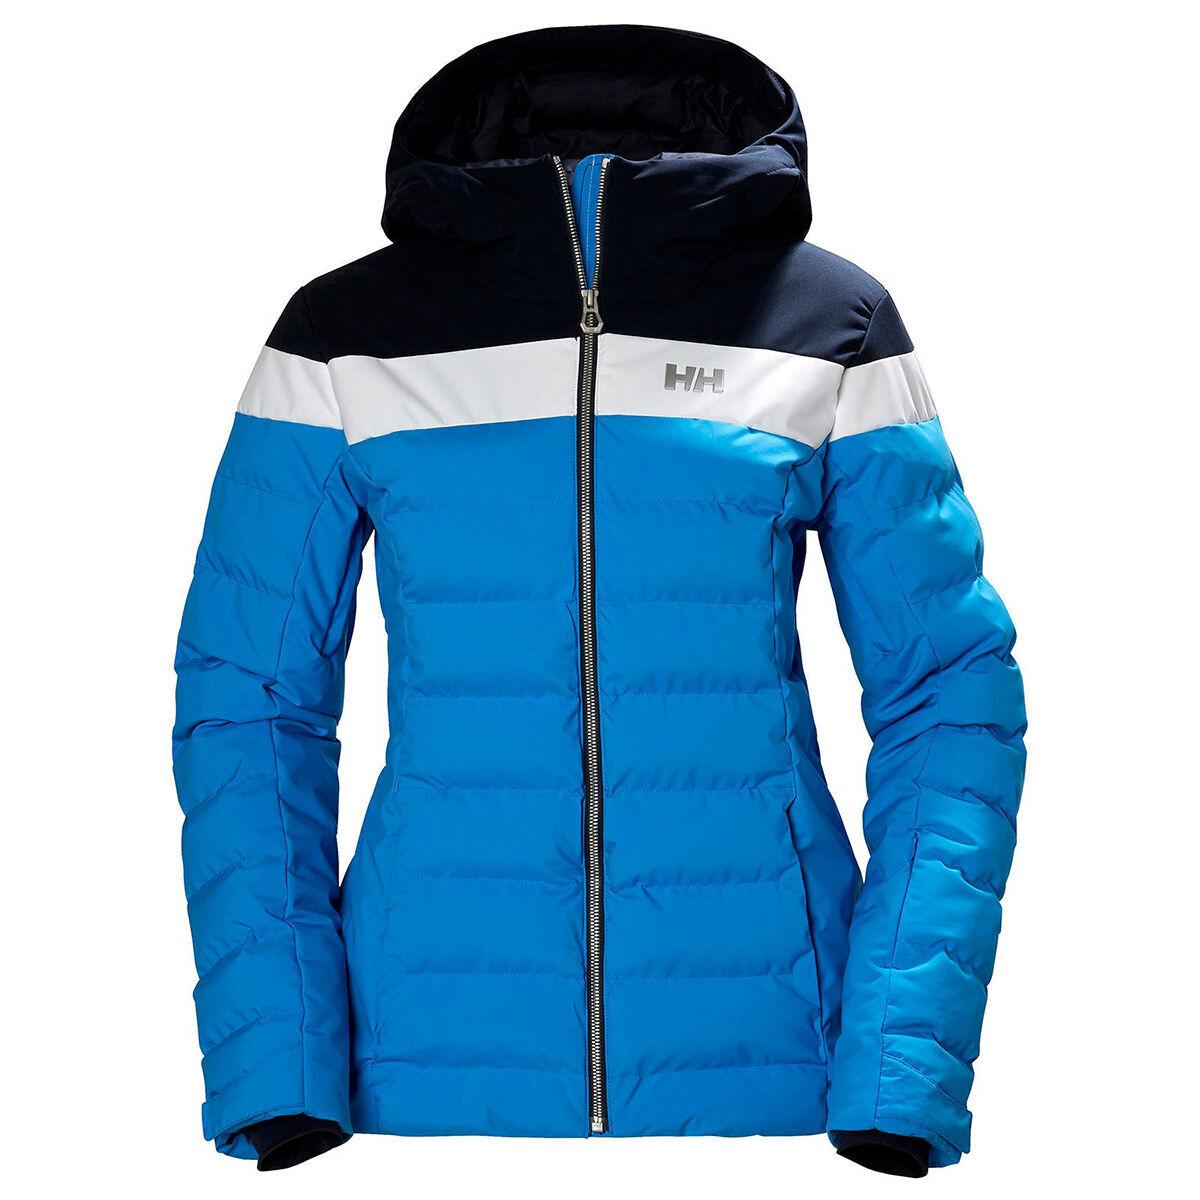 Helly Hansen Women's Imperial Puffy Jacket